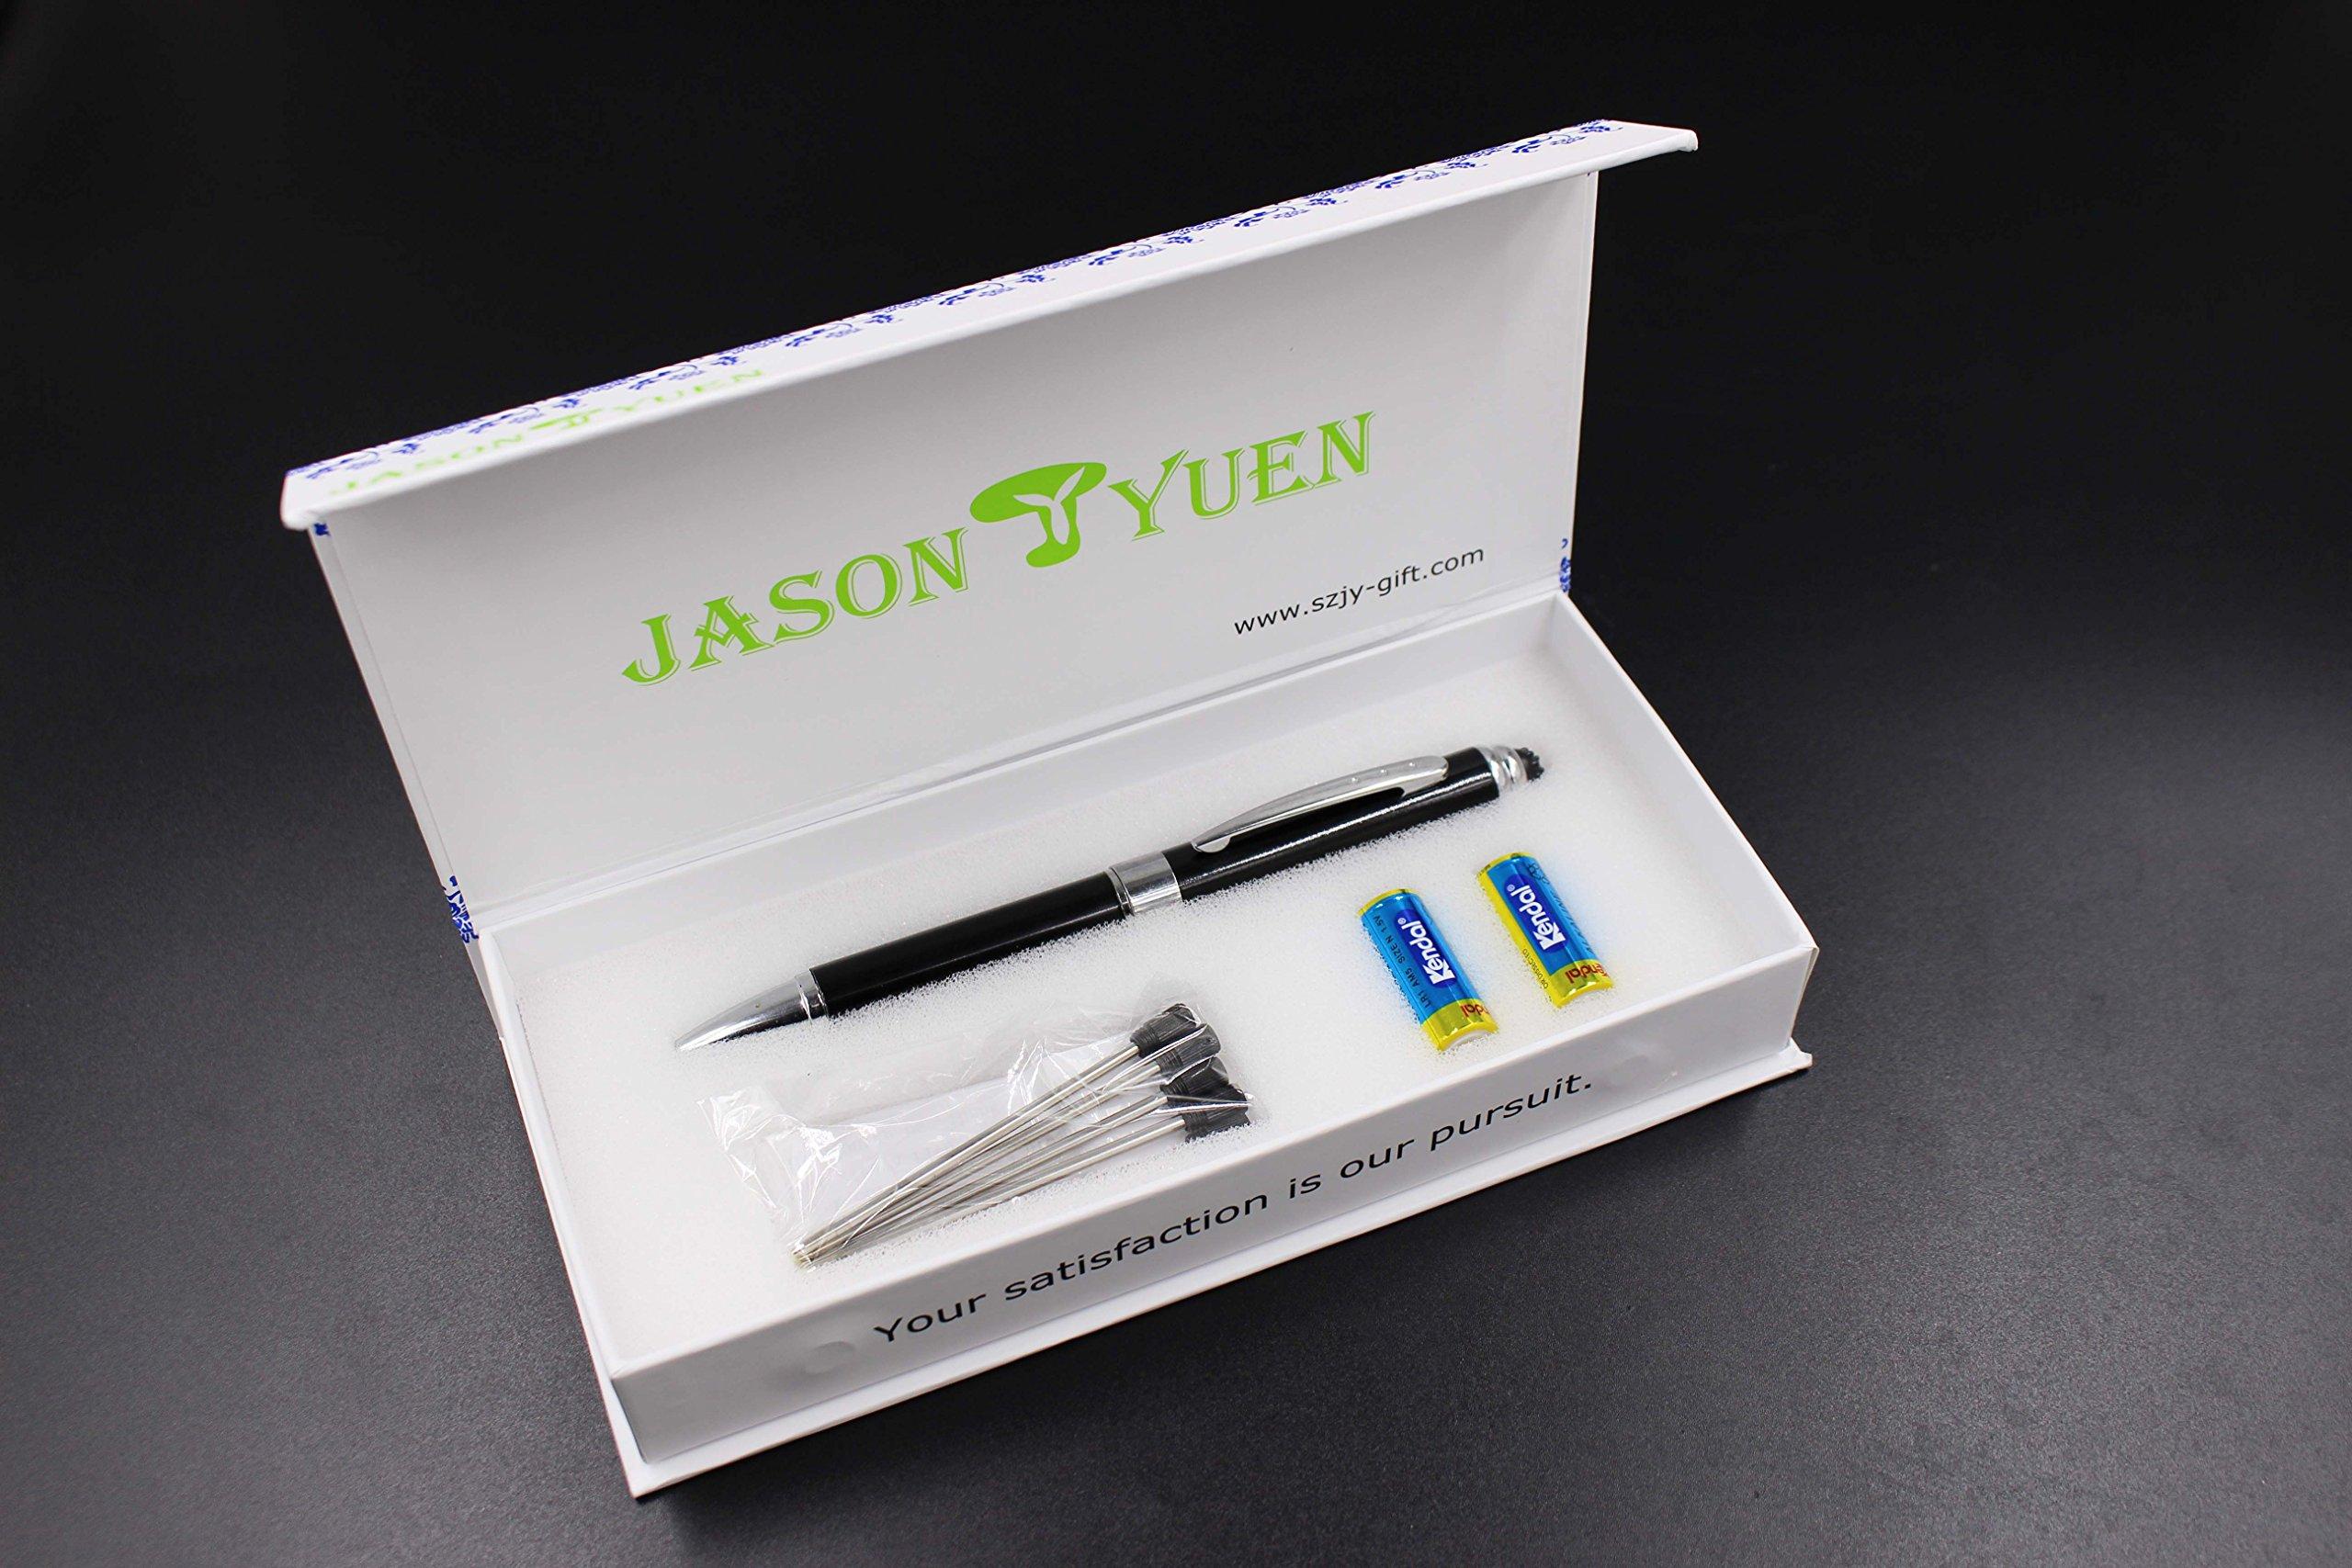 2 in 1 Vibration & massage ballpoint pen - mini Massage Tip Pen with Gift Box - Multifunction Electronic Pen (Black) by JASON YUEN (Image #8)